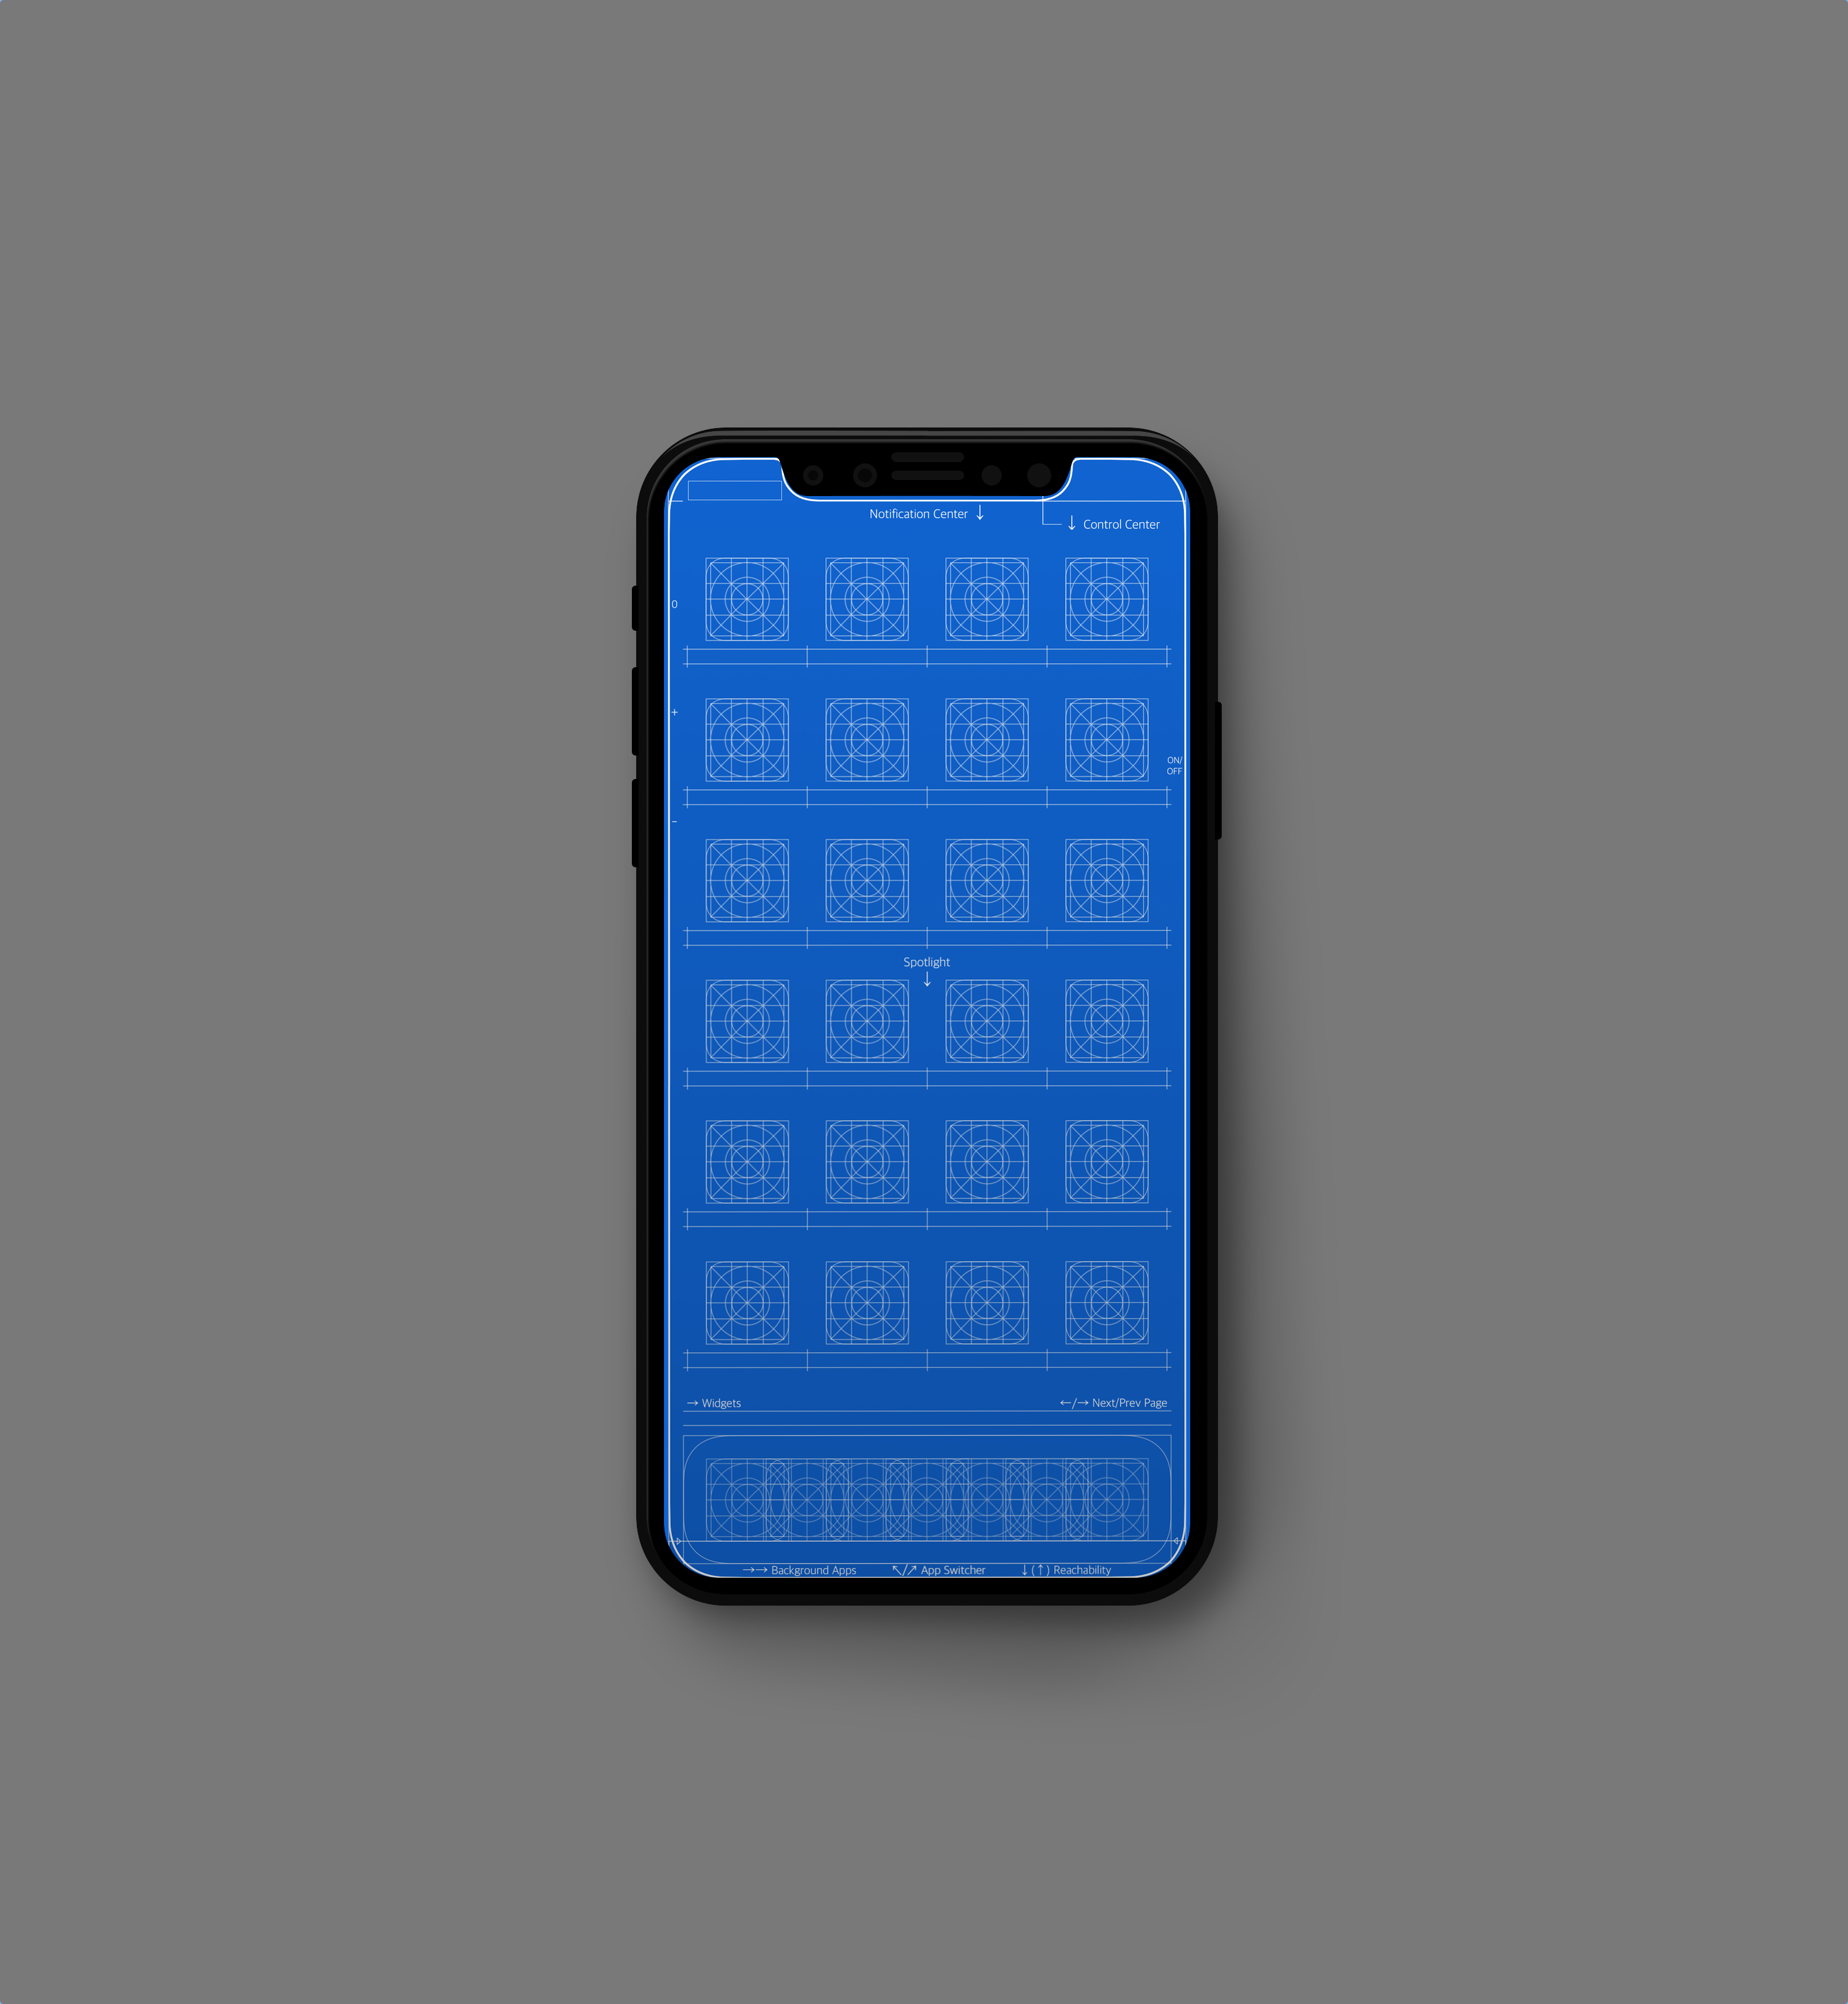 Best Iphone 6 Plus Wallpaper App